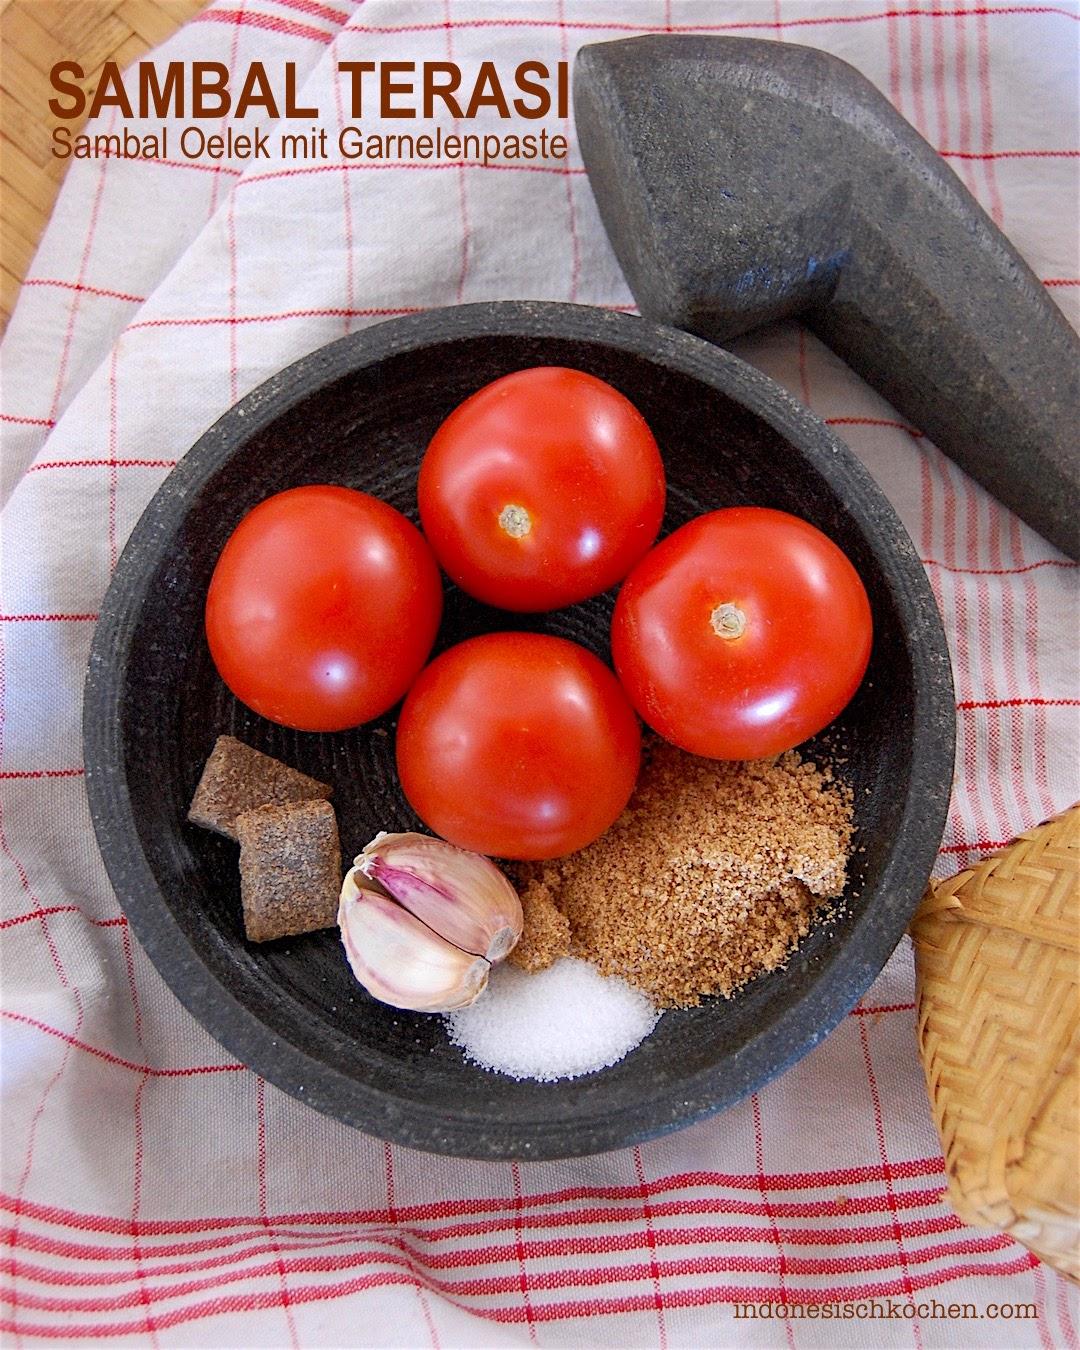 Rezept Sambal Oelek mit Garnelenpaste, Sambal Terasi indonesisch kochen